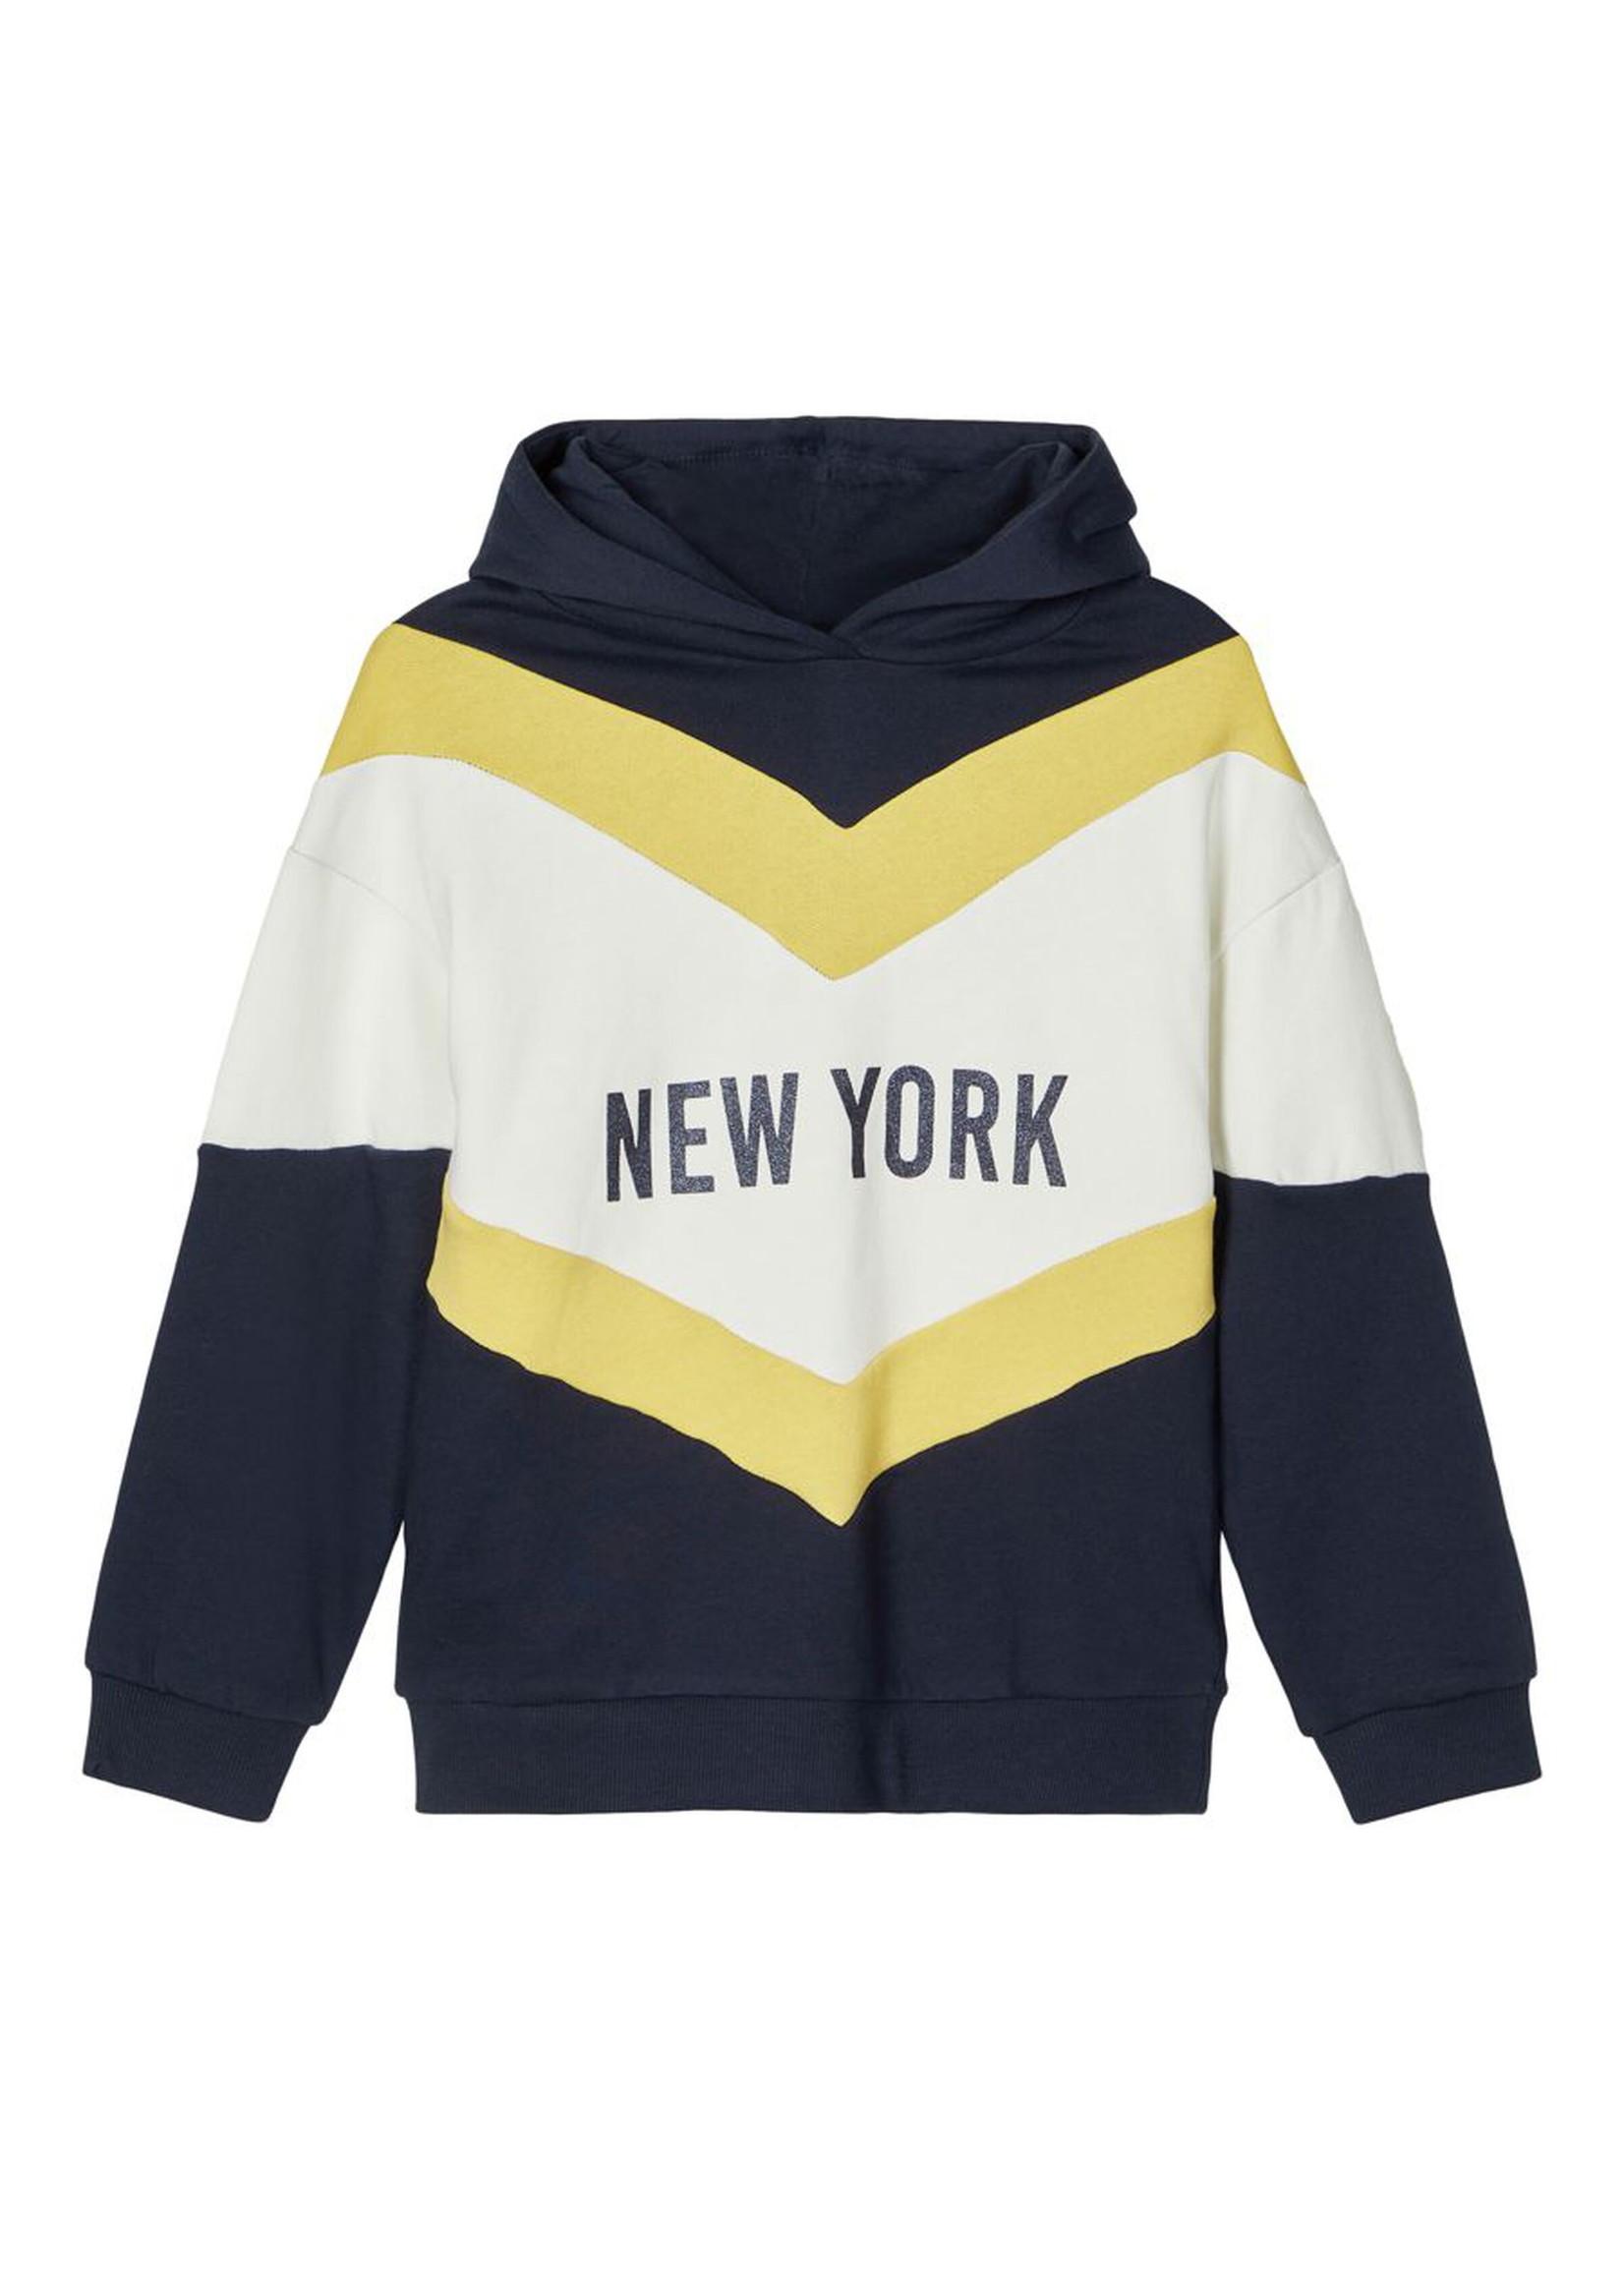 Name it hooded sweater maat 122/128 + 134/140